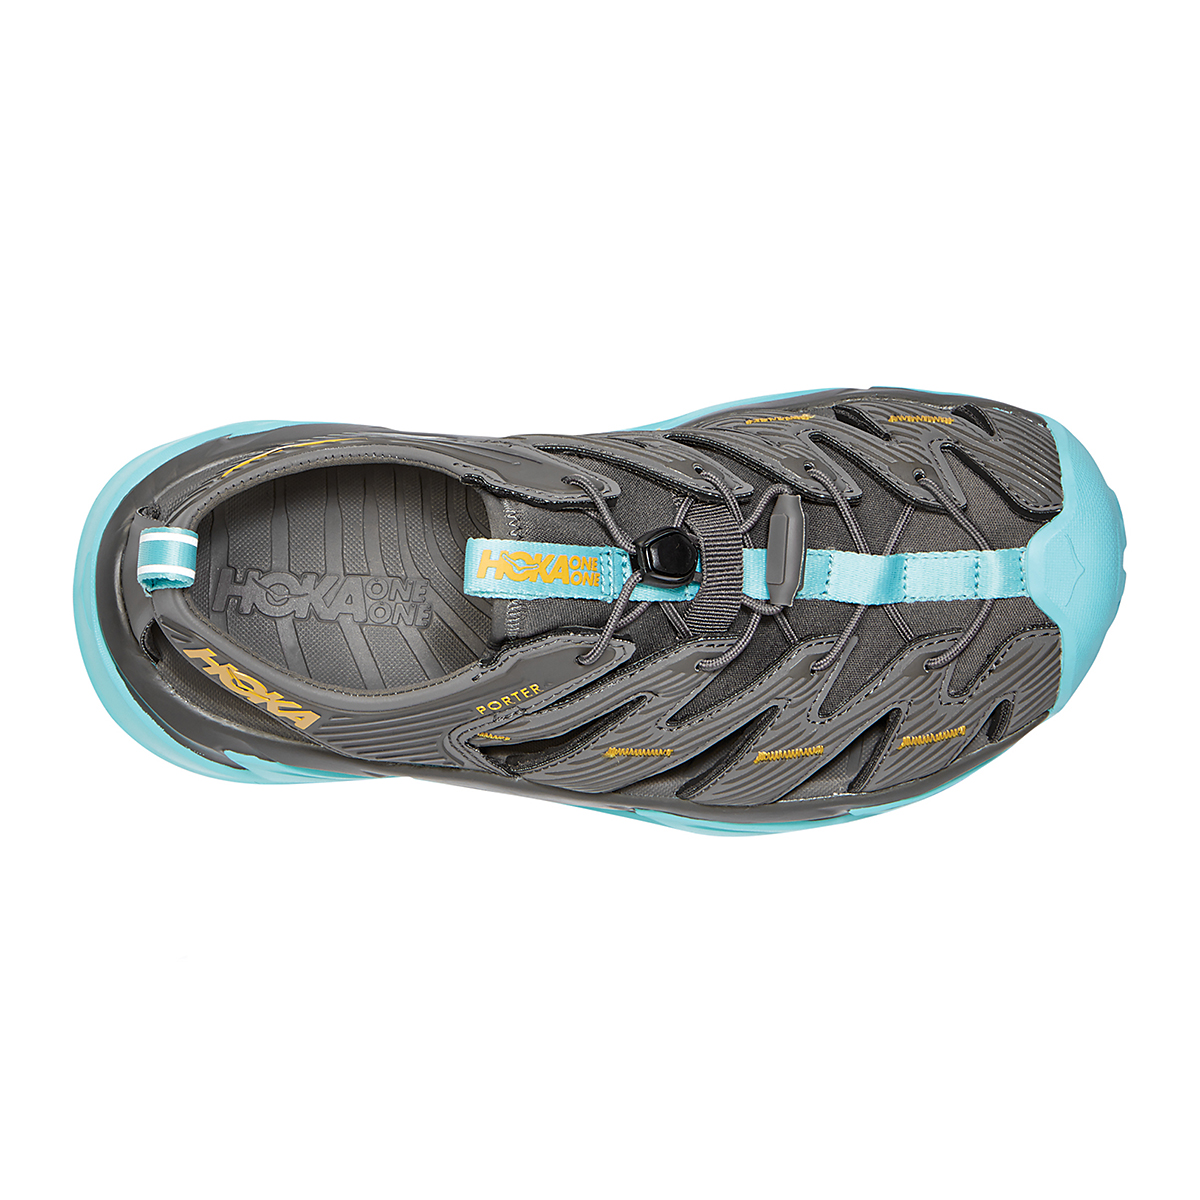 Women's Hoka One One Hopara Hiking Shoe - Color: Dark Gull Grey/Antigua Sand - Size: 5 - Width: Regular, Dark Gull Grey/Antigua Sand, large, image 5